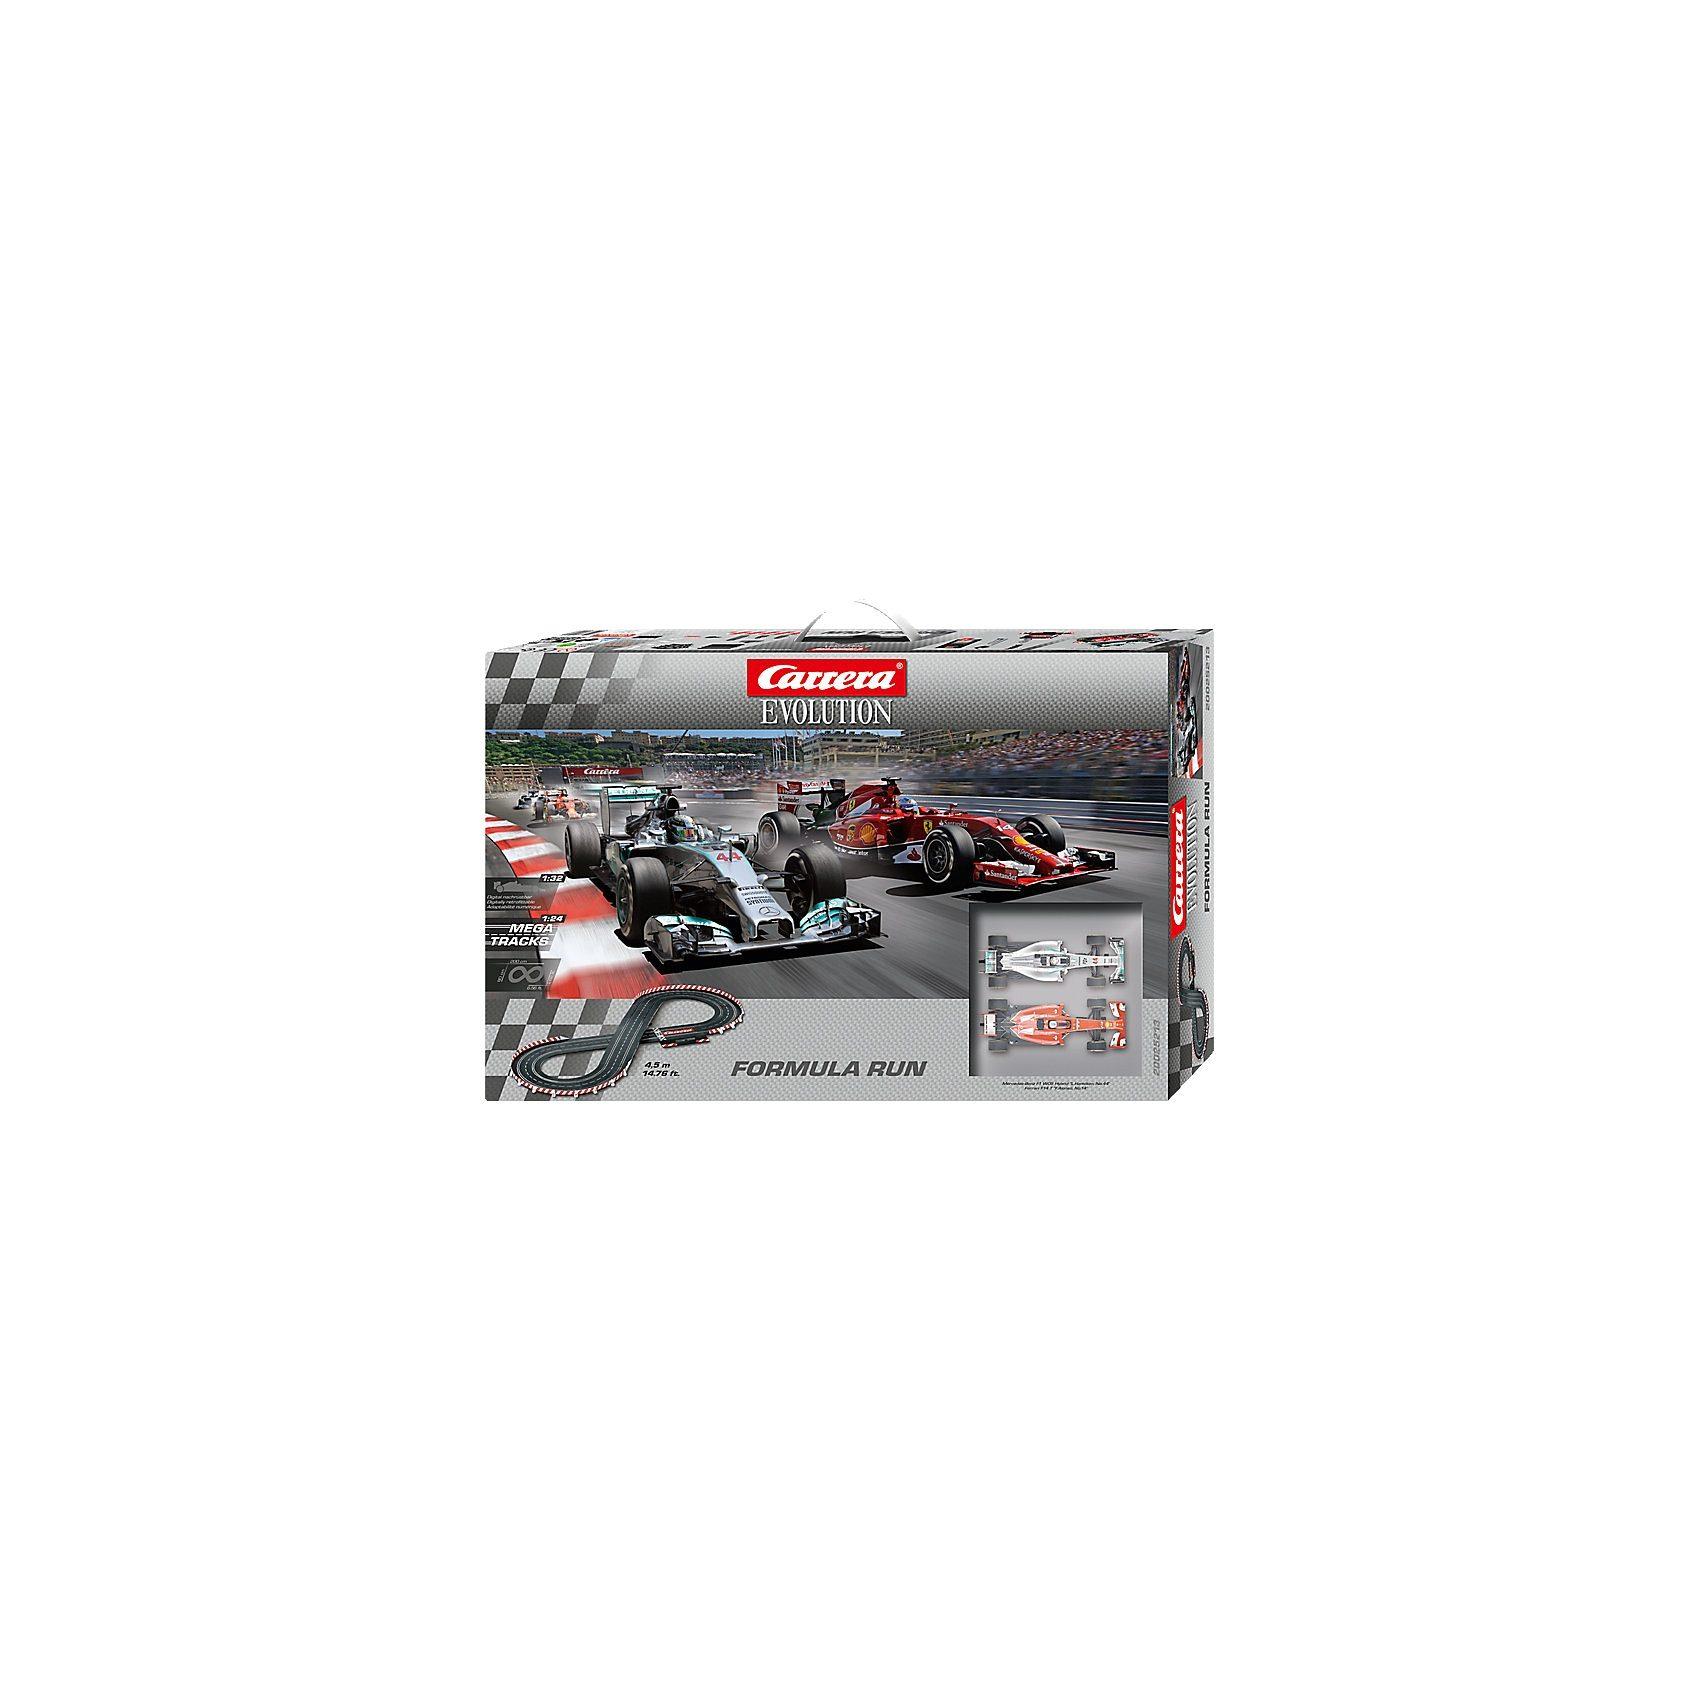 Carrera Evolution 25213 Formula Run